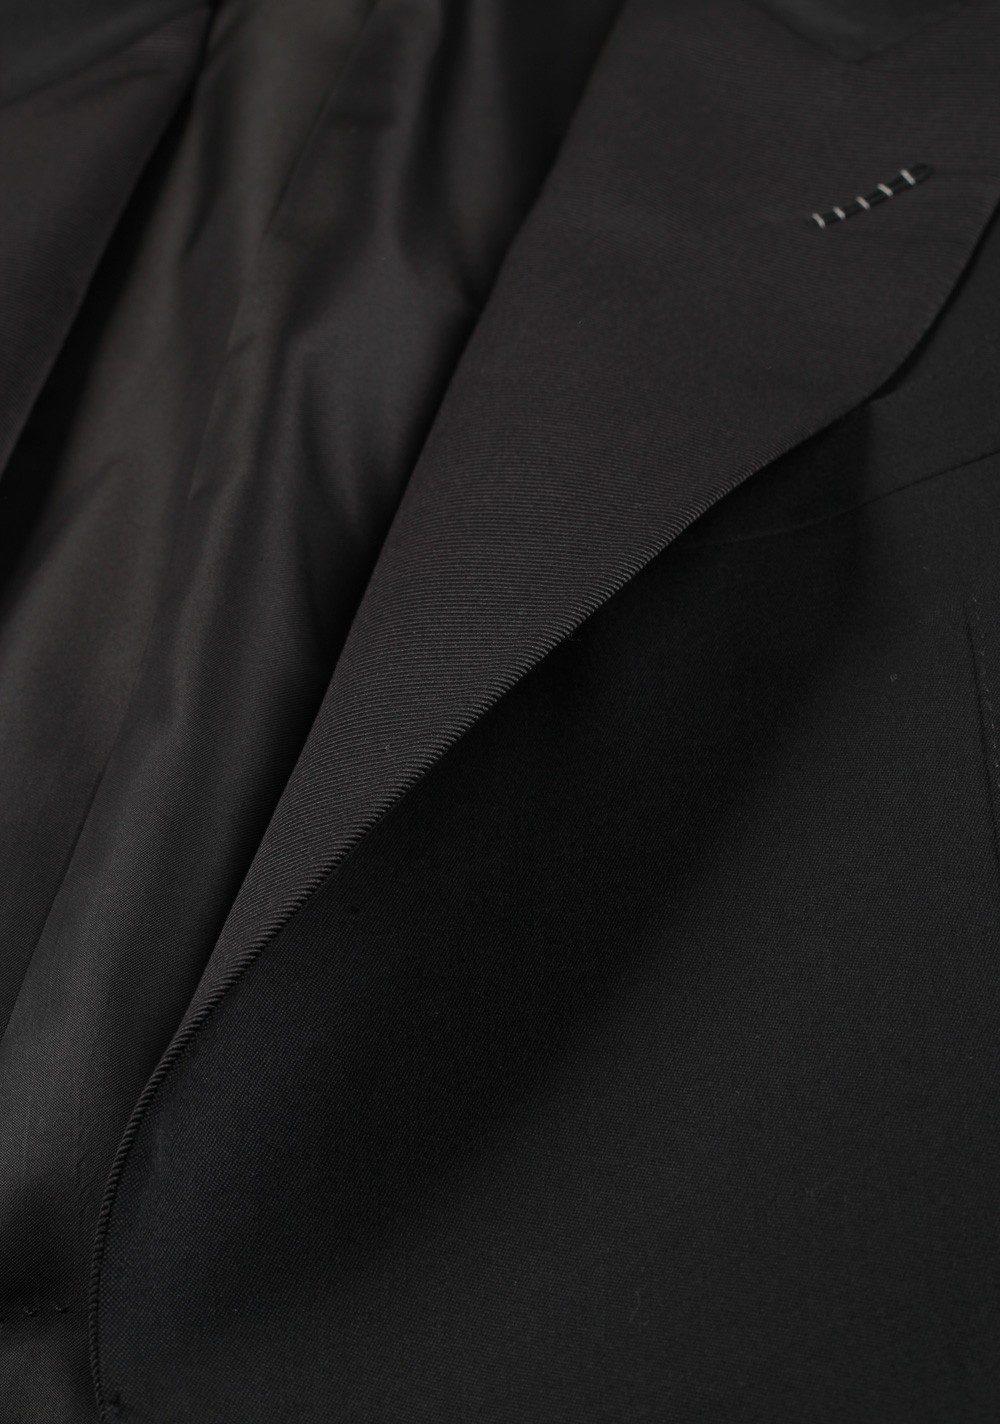 TOM FORD Windsor Black Tuxedo Dinner Jacket Size 50C / 40S U.S. Fit A | Costume Limité